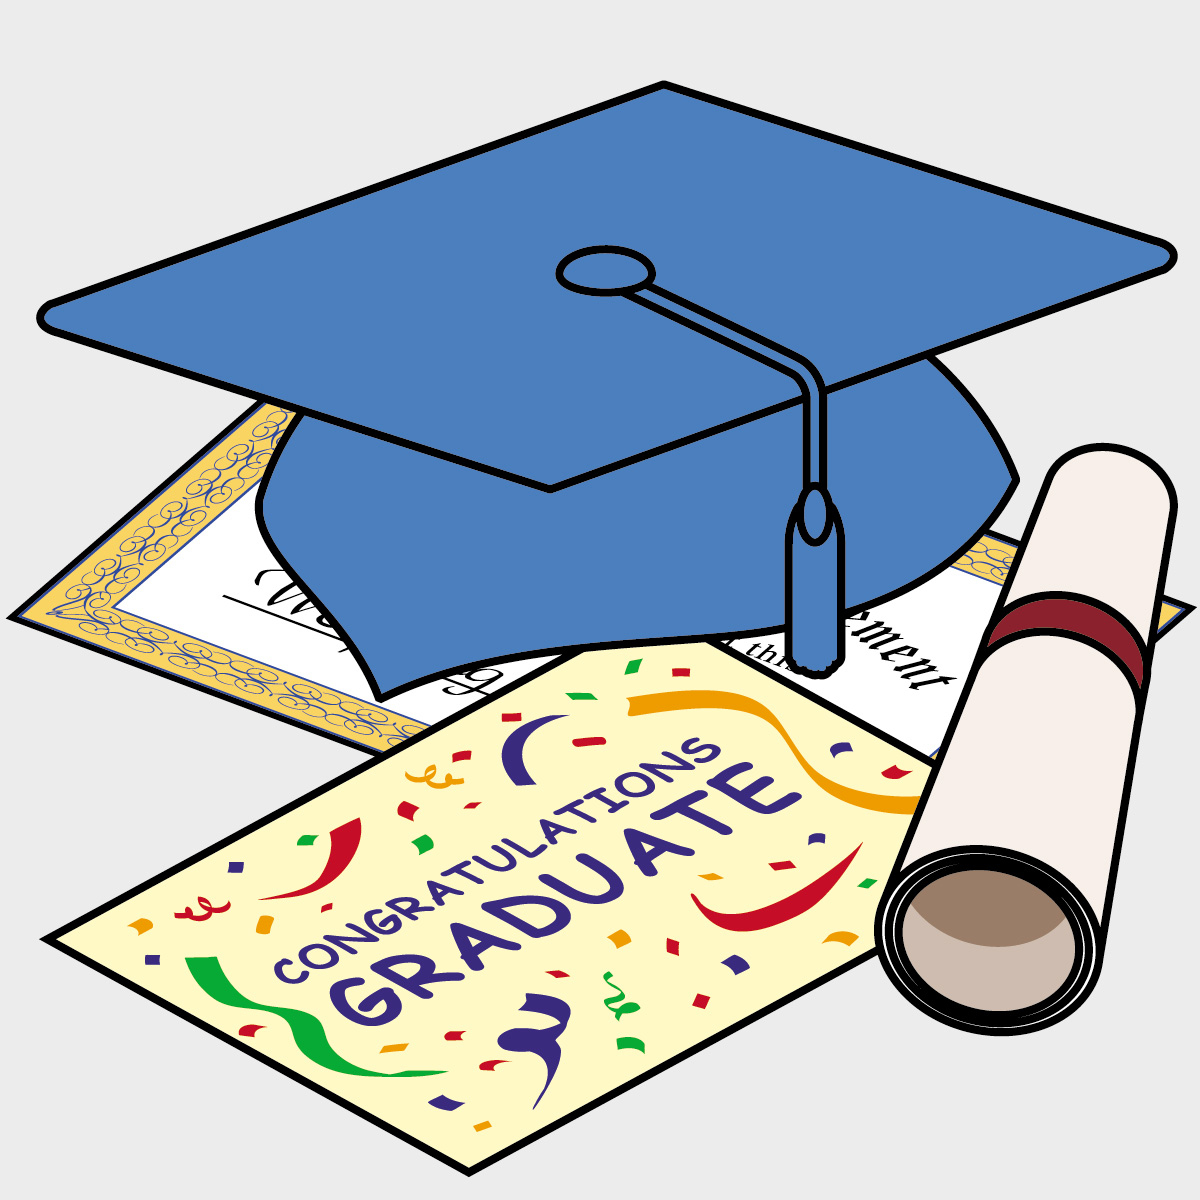 Kindergarten Graduation Clipart | Clipart Panda - Free Clipart Images - Free Printable Kindergarten Graduation Clipart